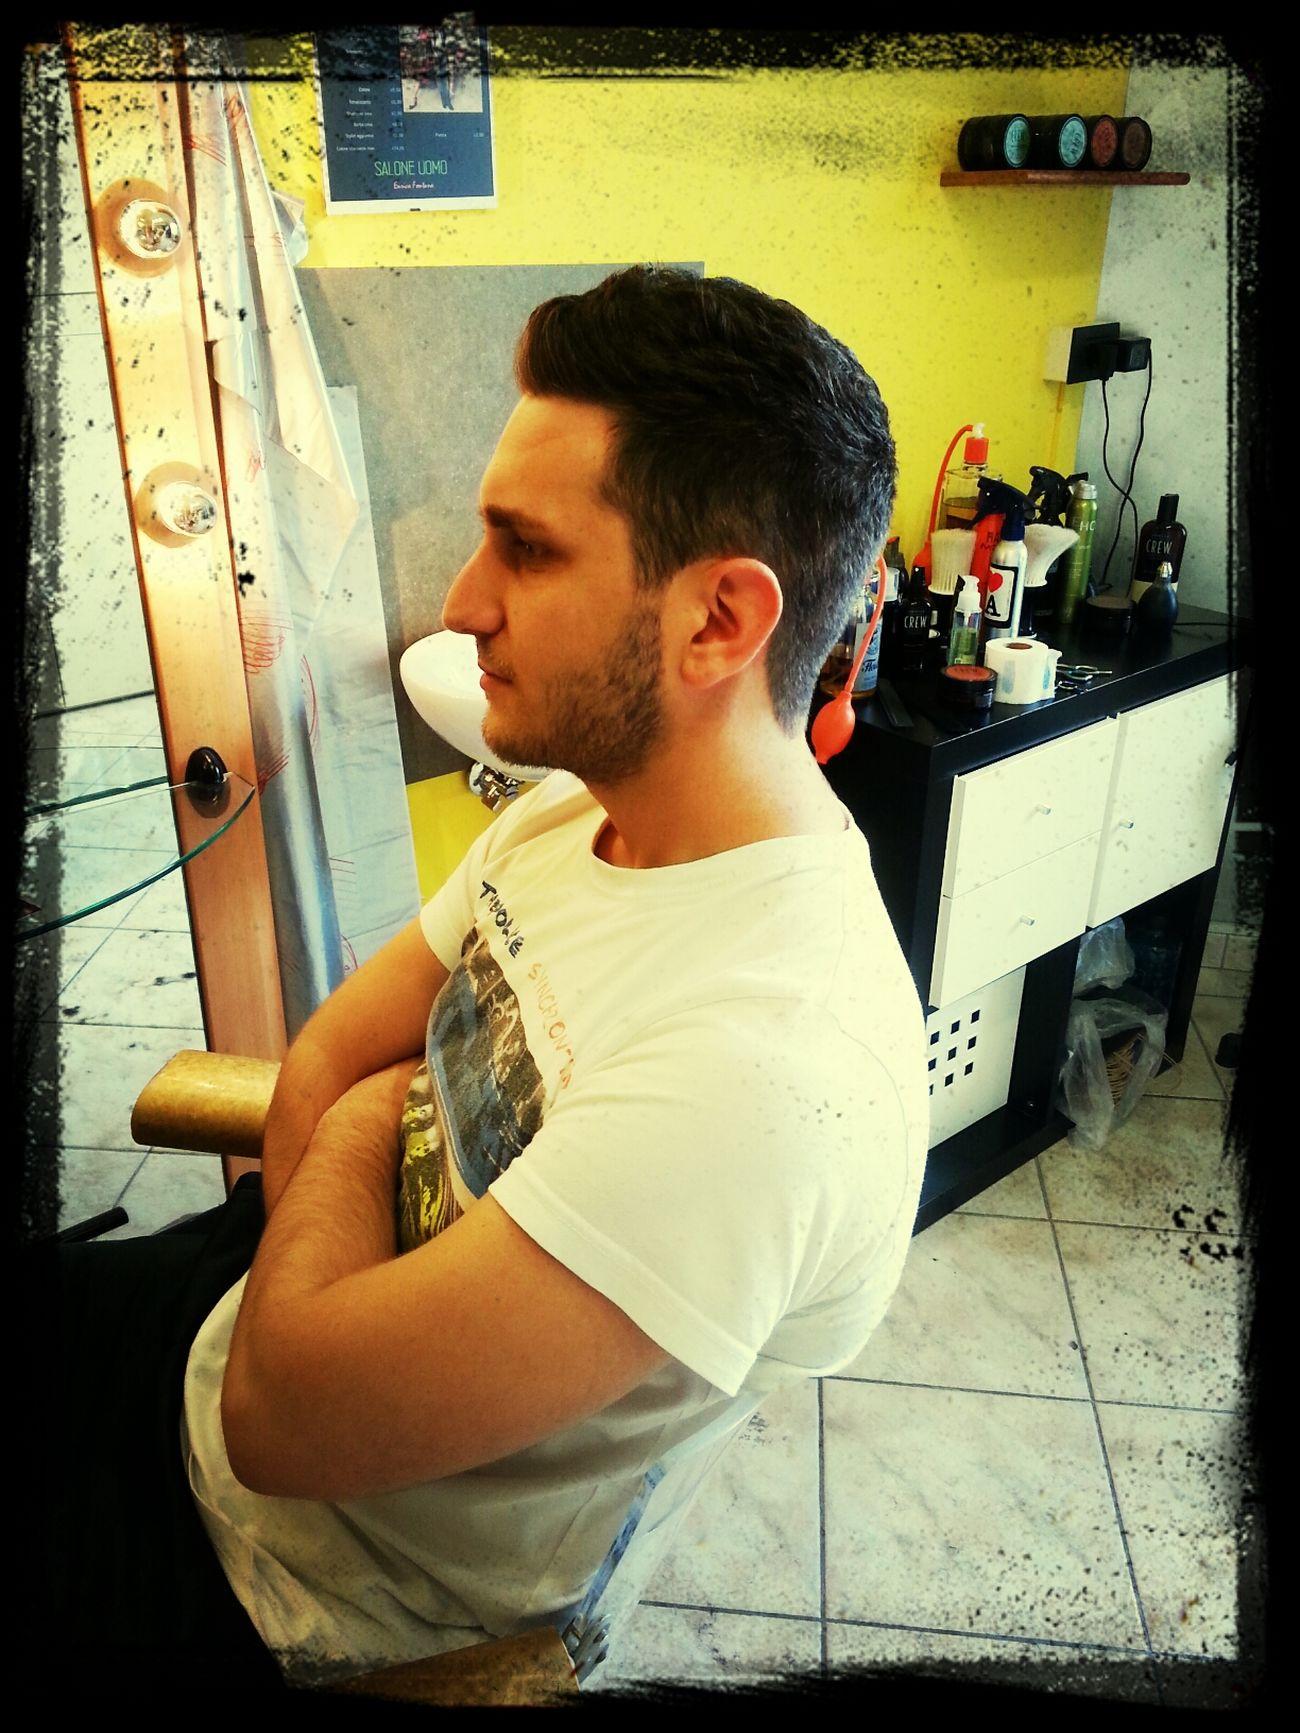 hair style fontana enrico☆☆☆